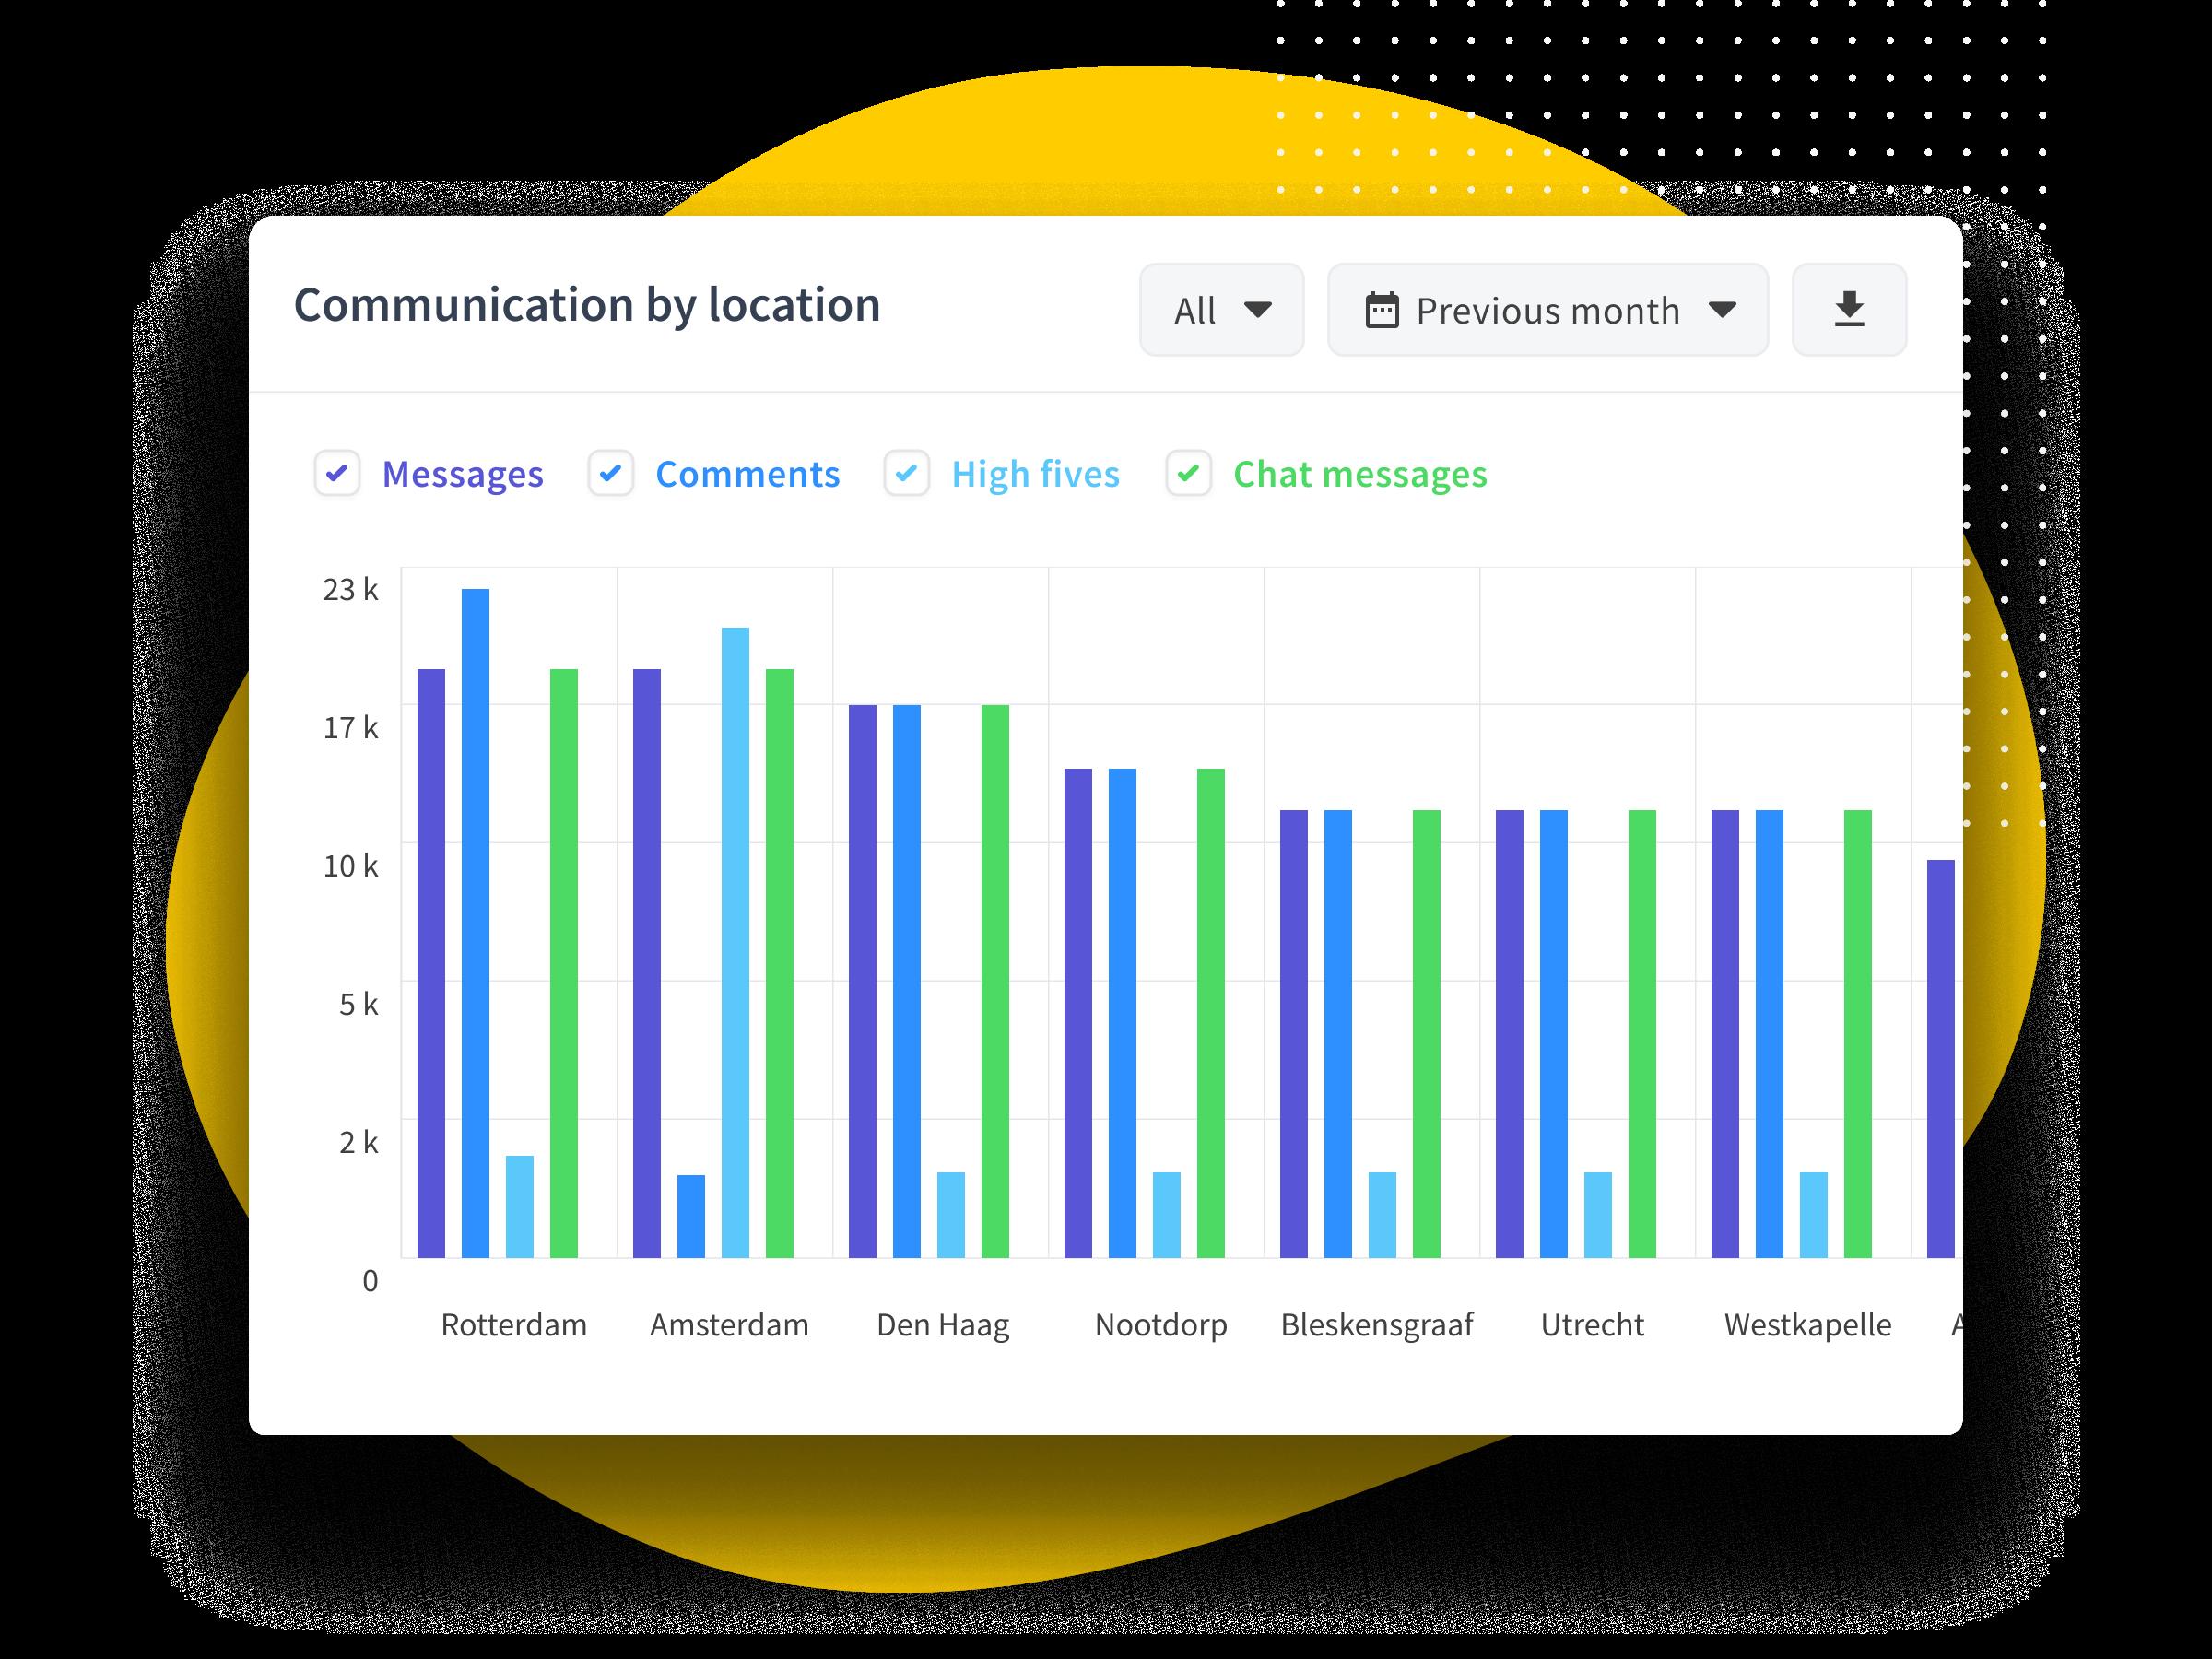 Internal communication insights